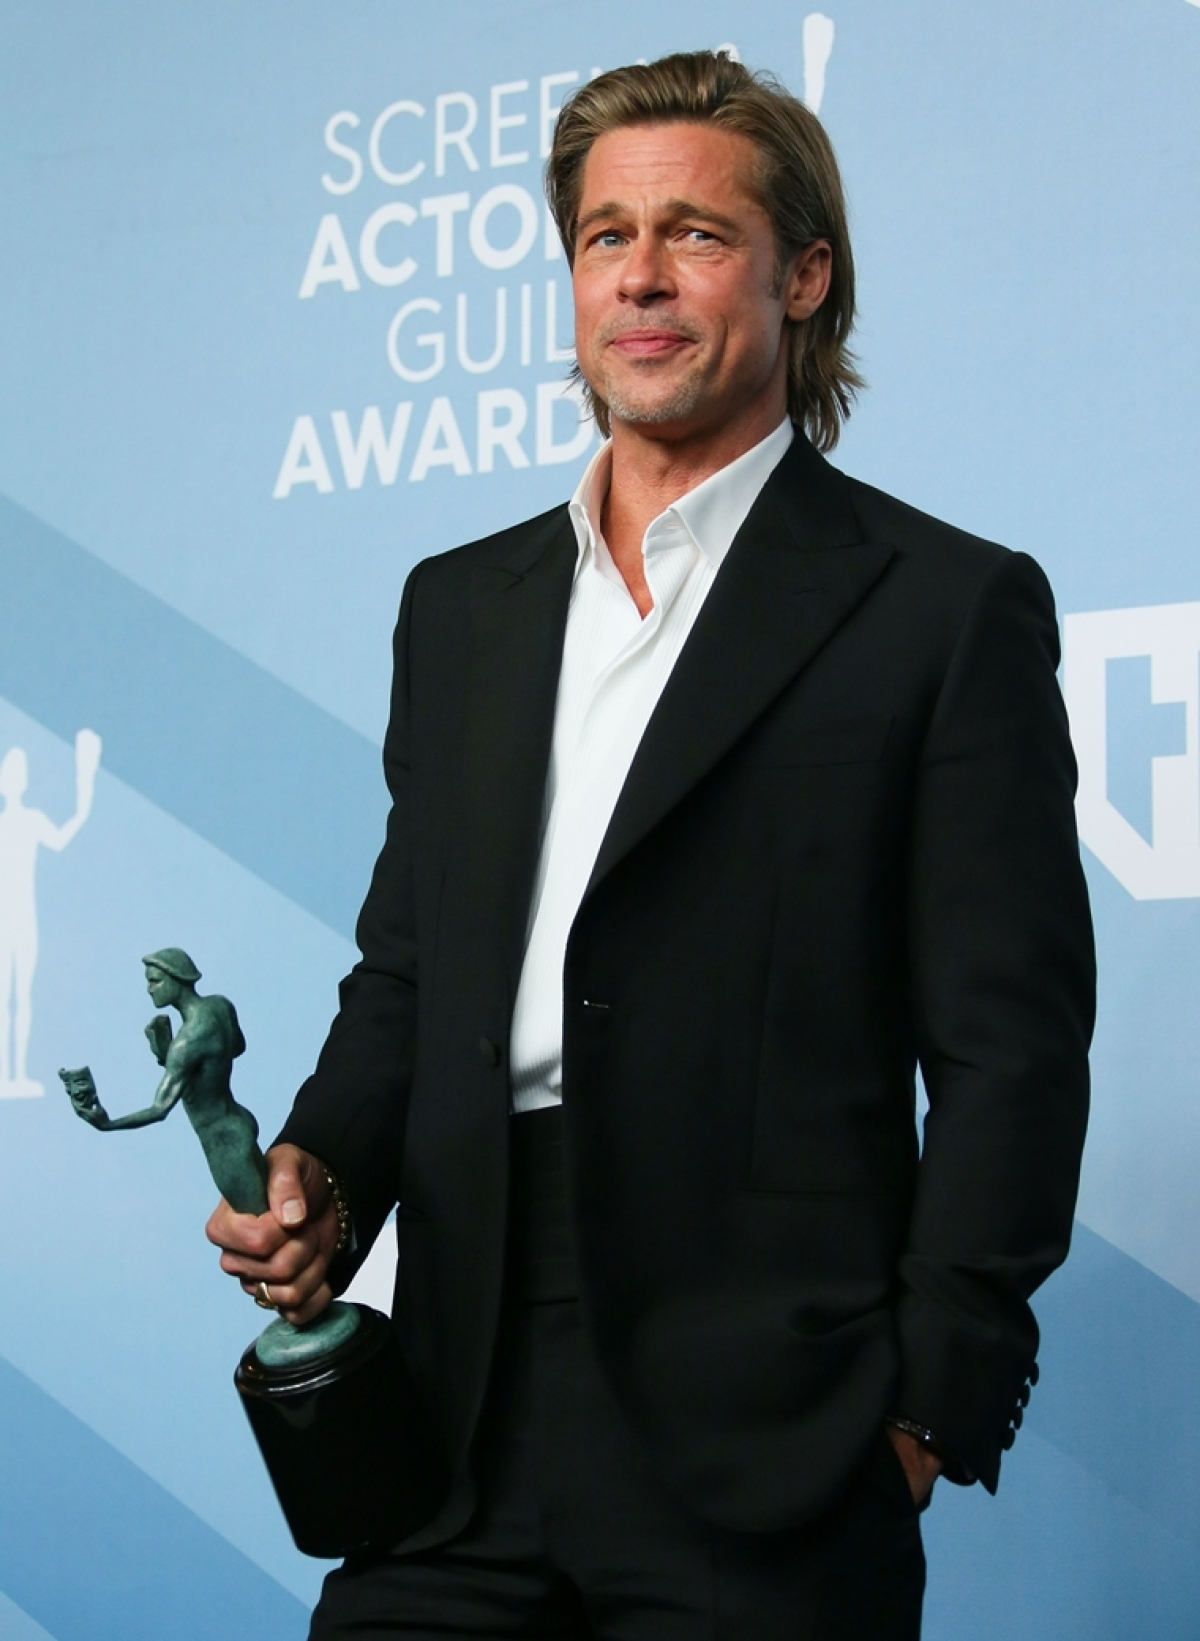 Brad Pitt drops everything backstage to watch Jennifer Aniston's speech at SAG Awards